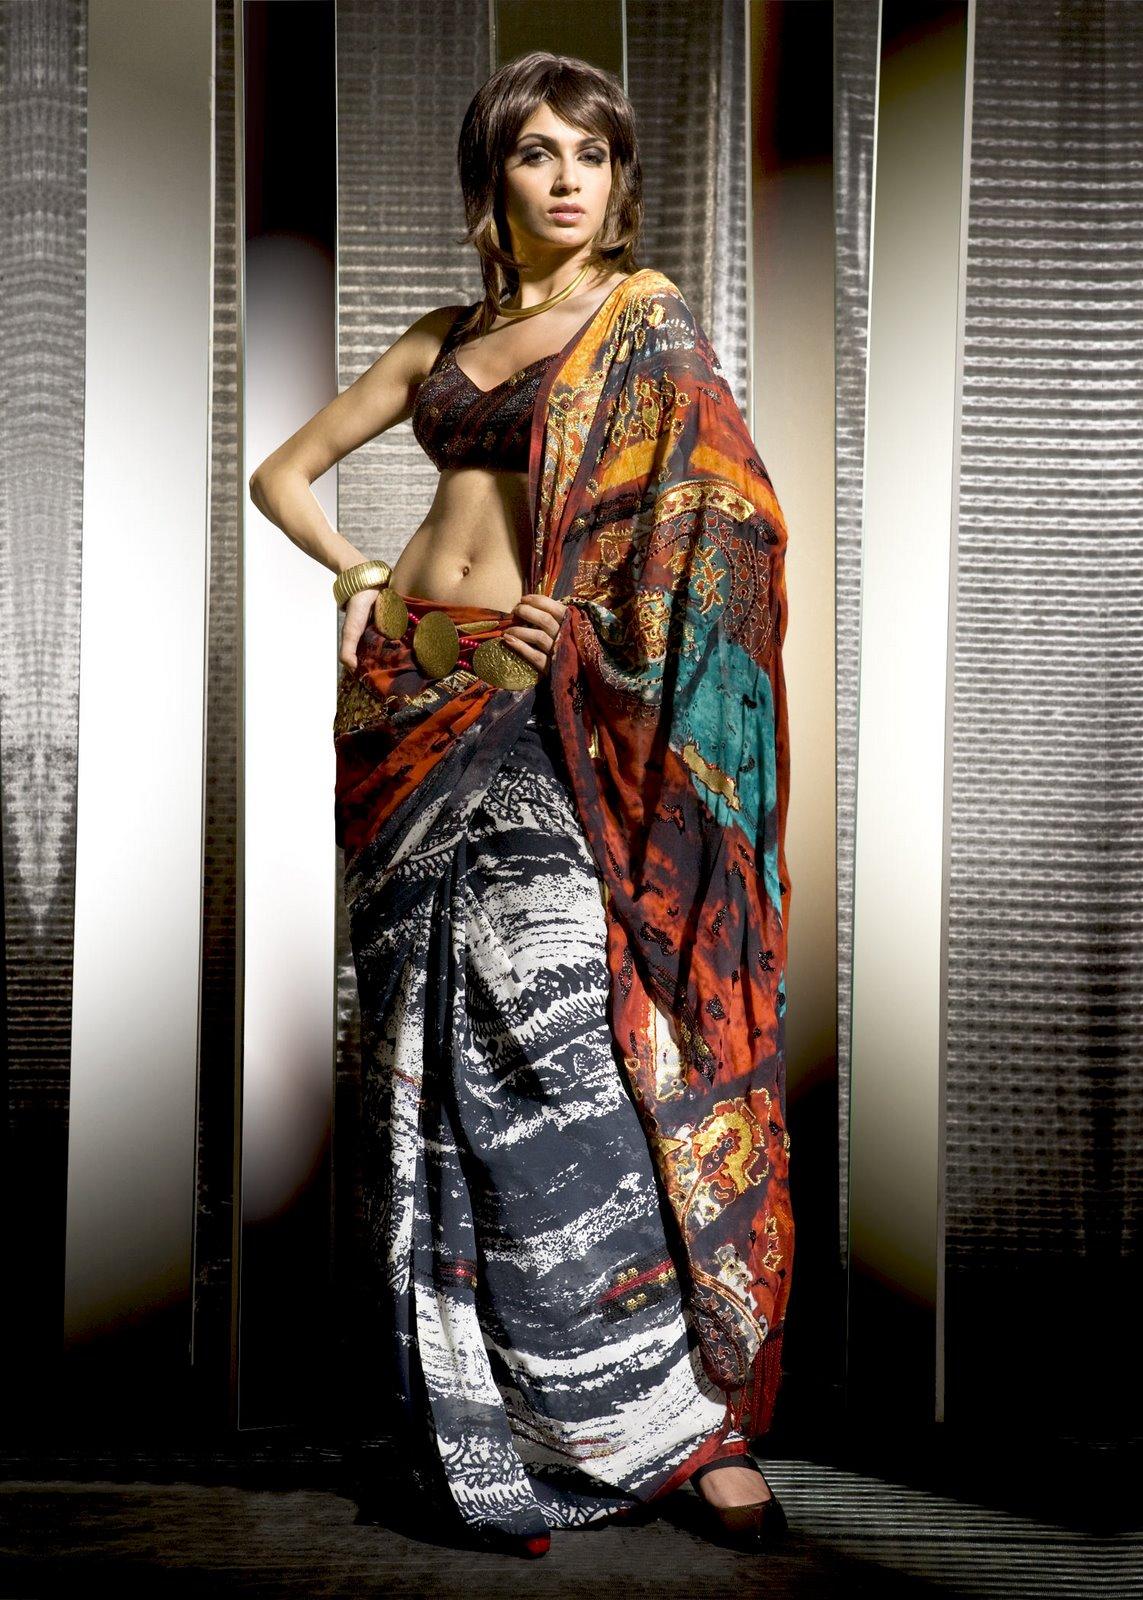 , Simran Kaur Mundi in Saree, Satya Paul Photo Shoot